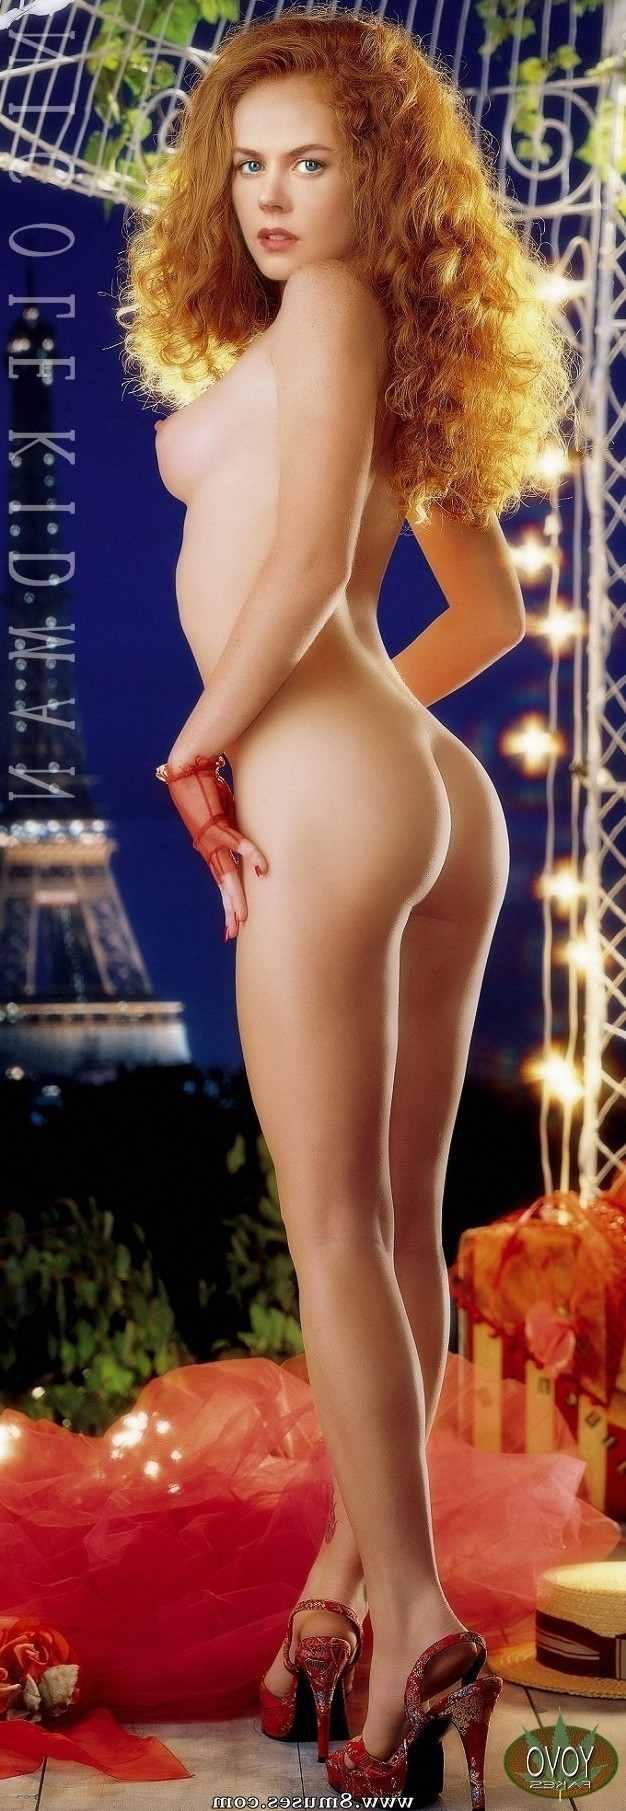 Fake-Celebrities-Sex-Pictures/Nicole-Kidman Nicole_Kidman__8muses_-_Sex_and_Porn_Comics_535.jpg